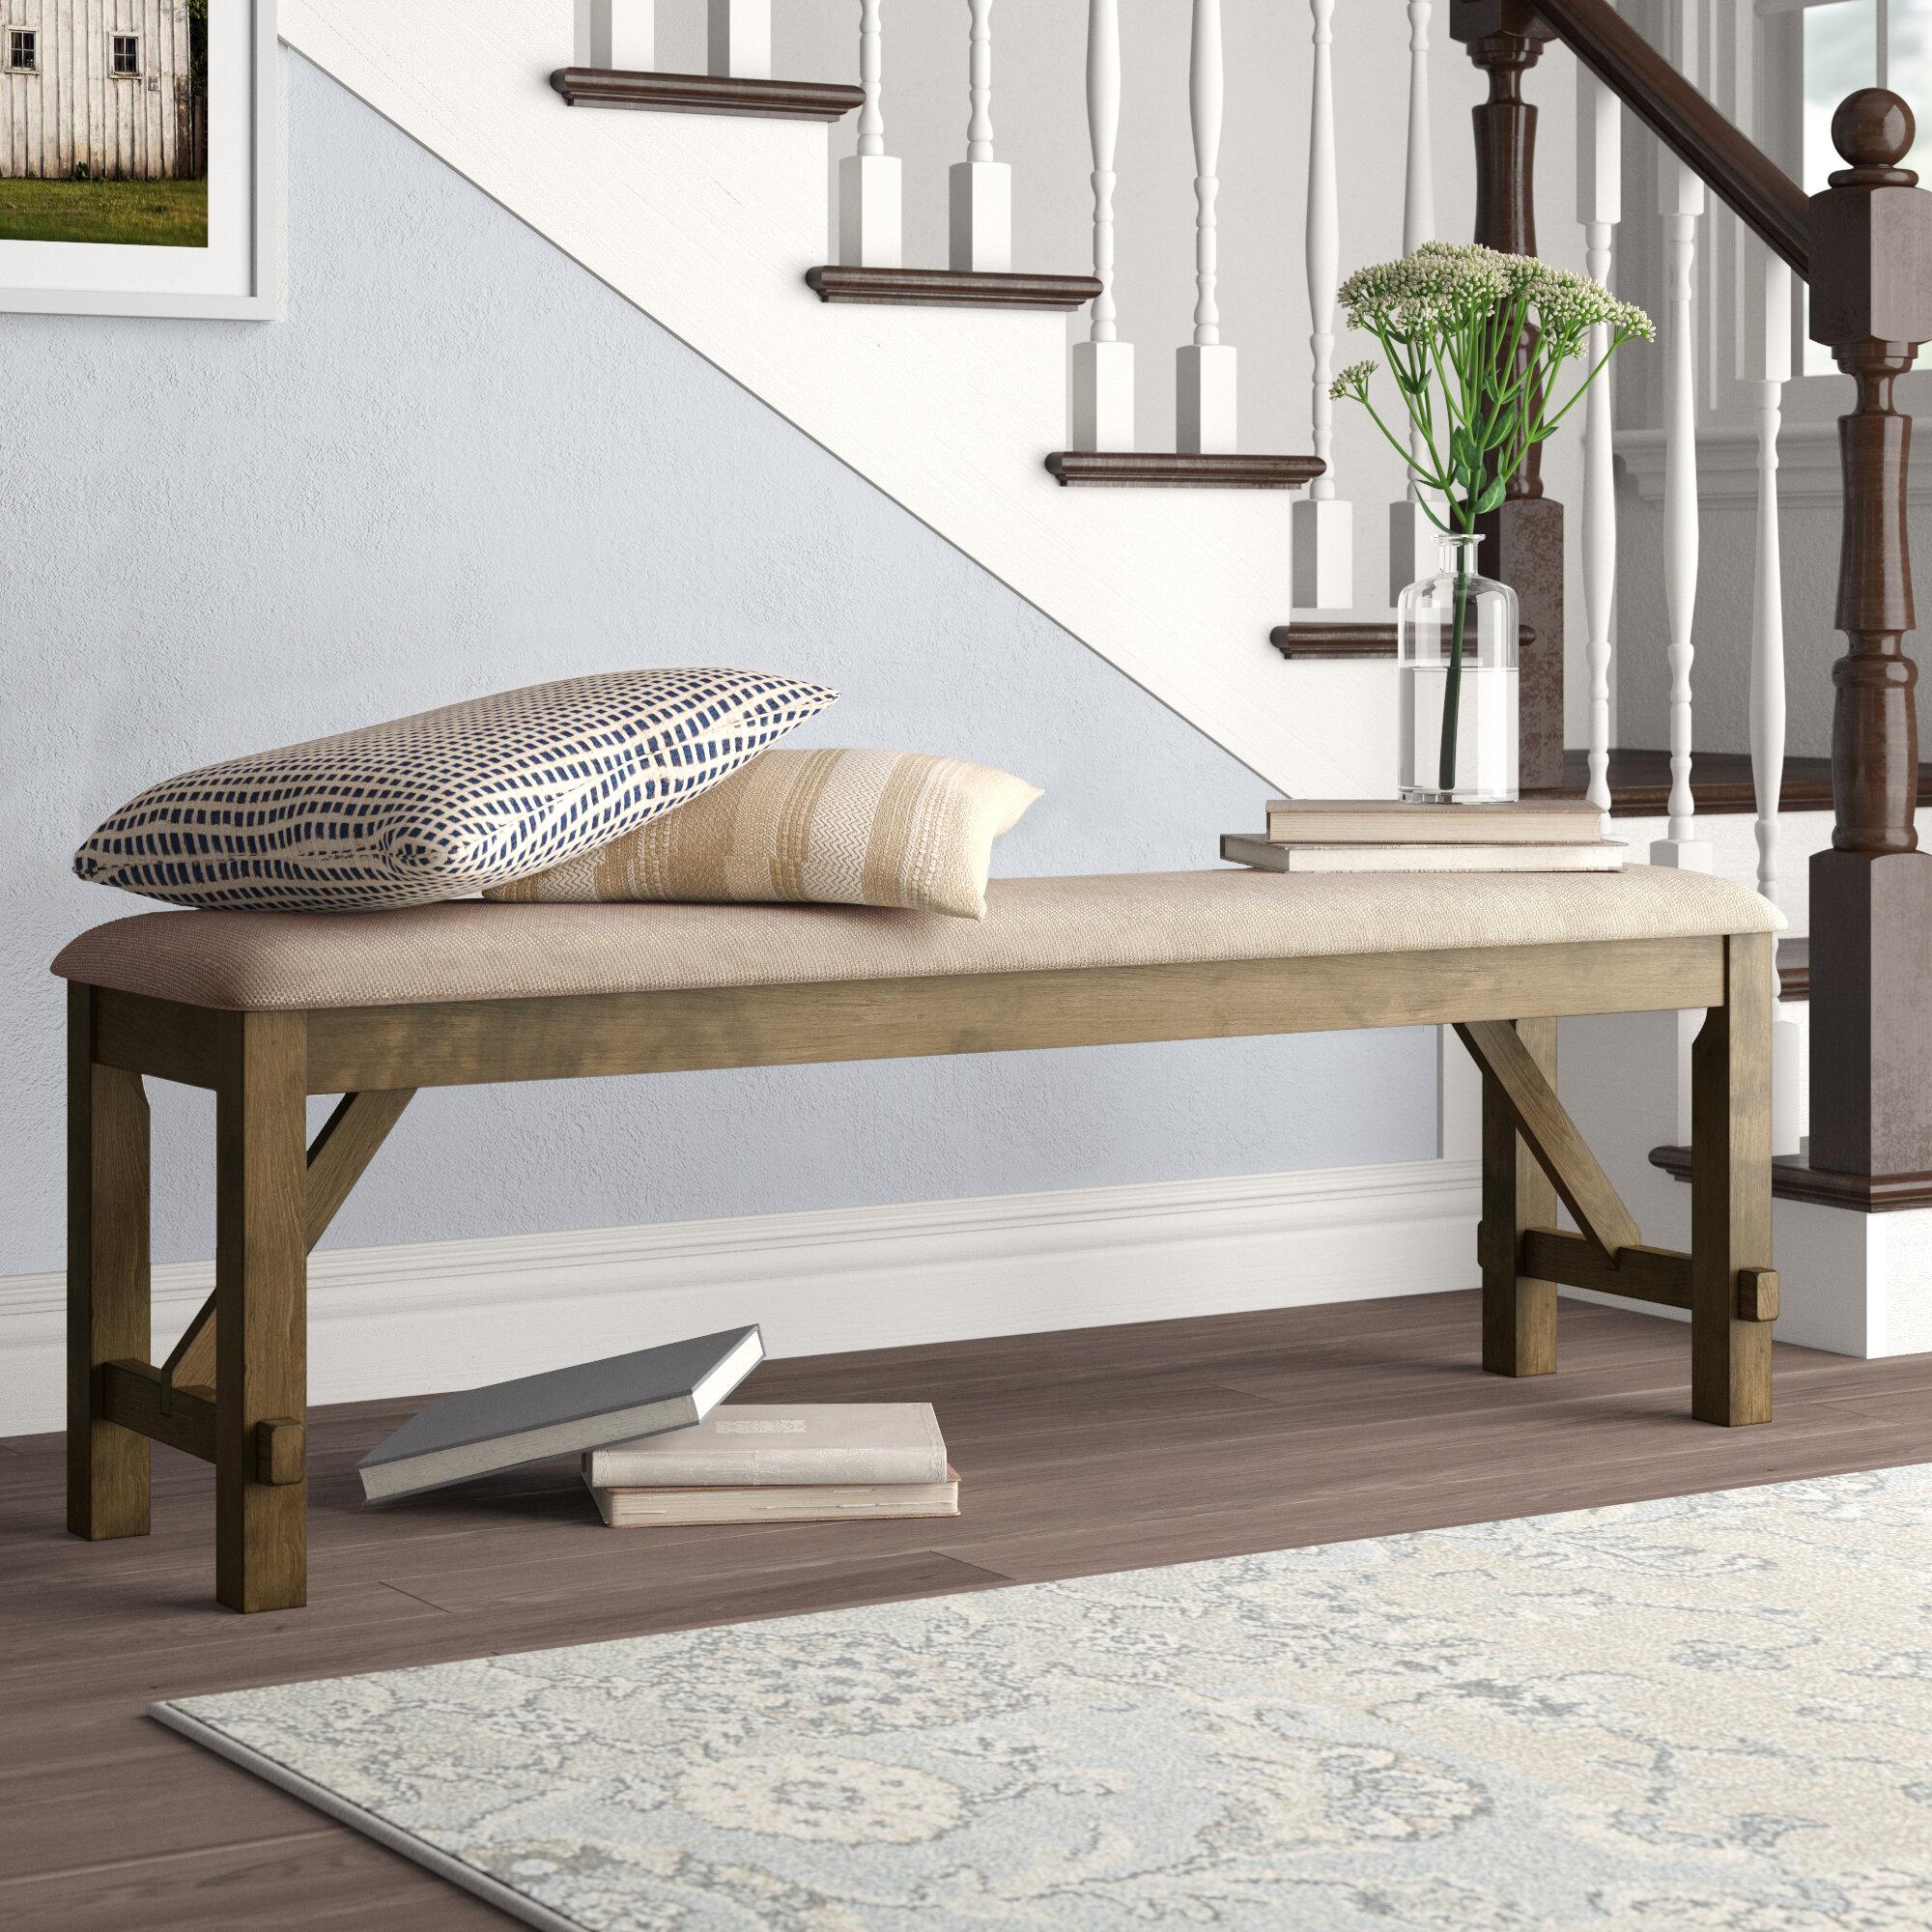 Gracie Oaks Poe Upholstered Bench Reviews Wayfair